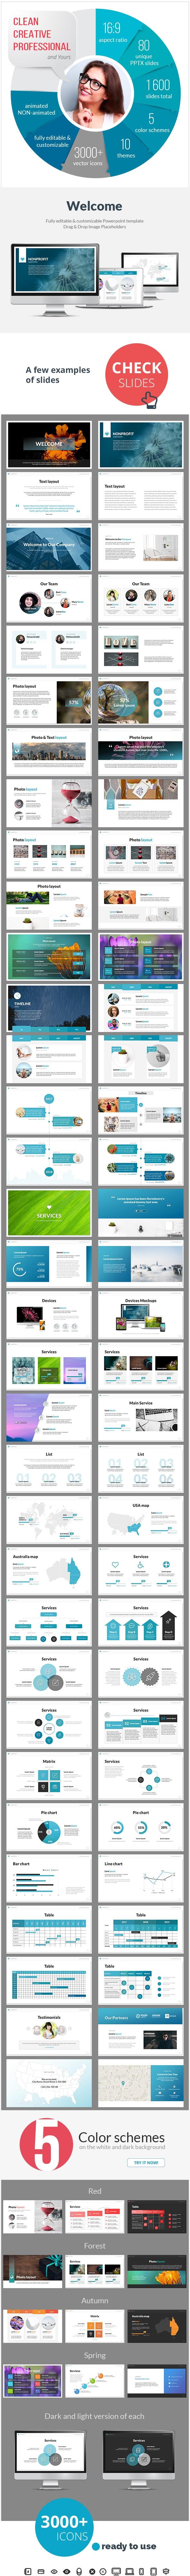 Multipurpose Nonprofit PowerPoint Presentation Template - PowerPoint Templates Presentation Templates